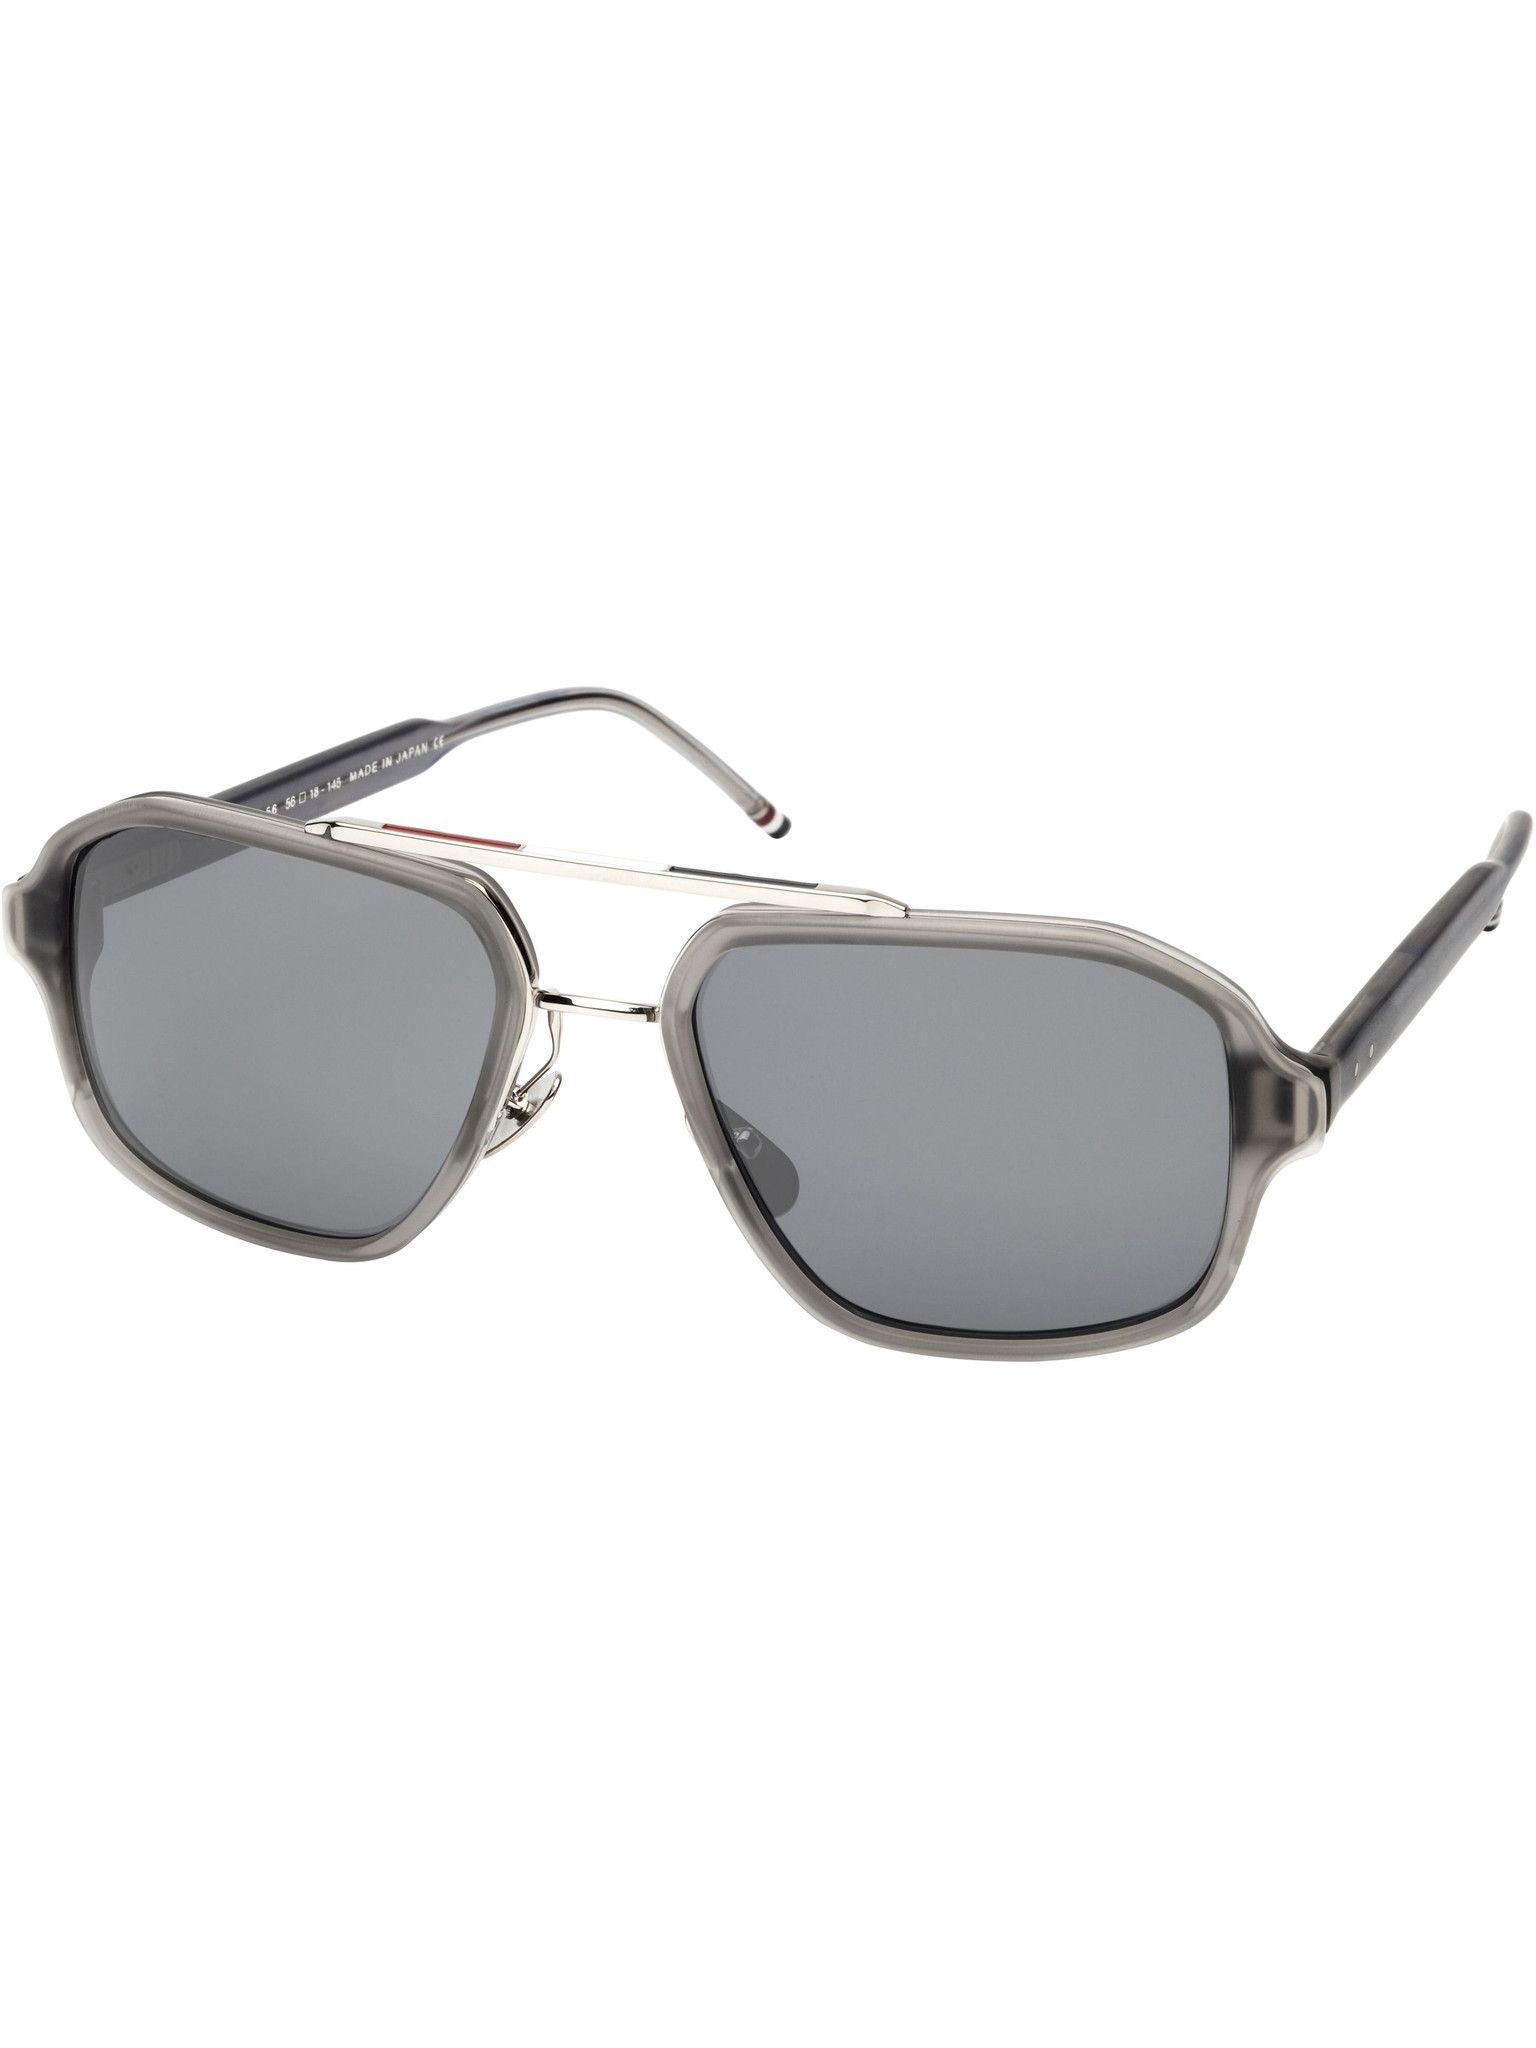 a060d44b2 Thom Browne TB-017C-T Sunglasses | Products | Thom browne eyewear ...